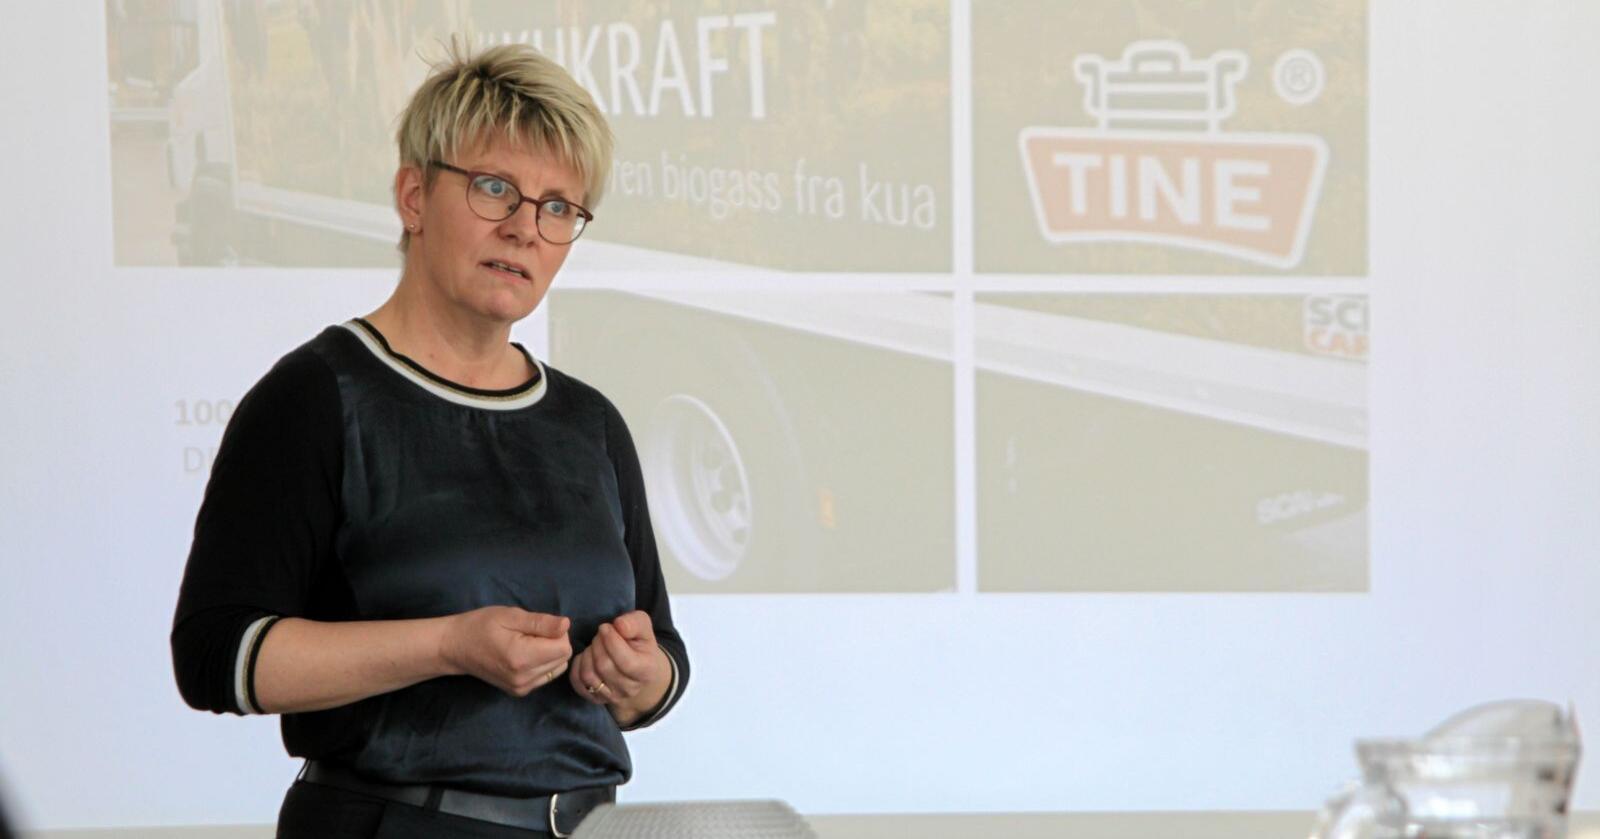 Styreleiar Marit Haugen i Tine. Foto: Janne Grete Aspen